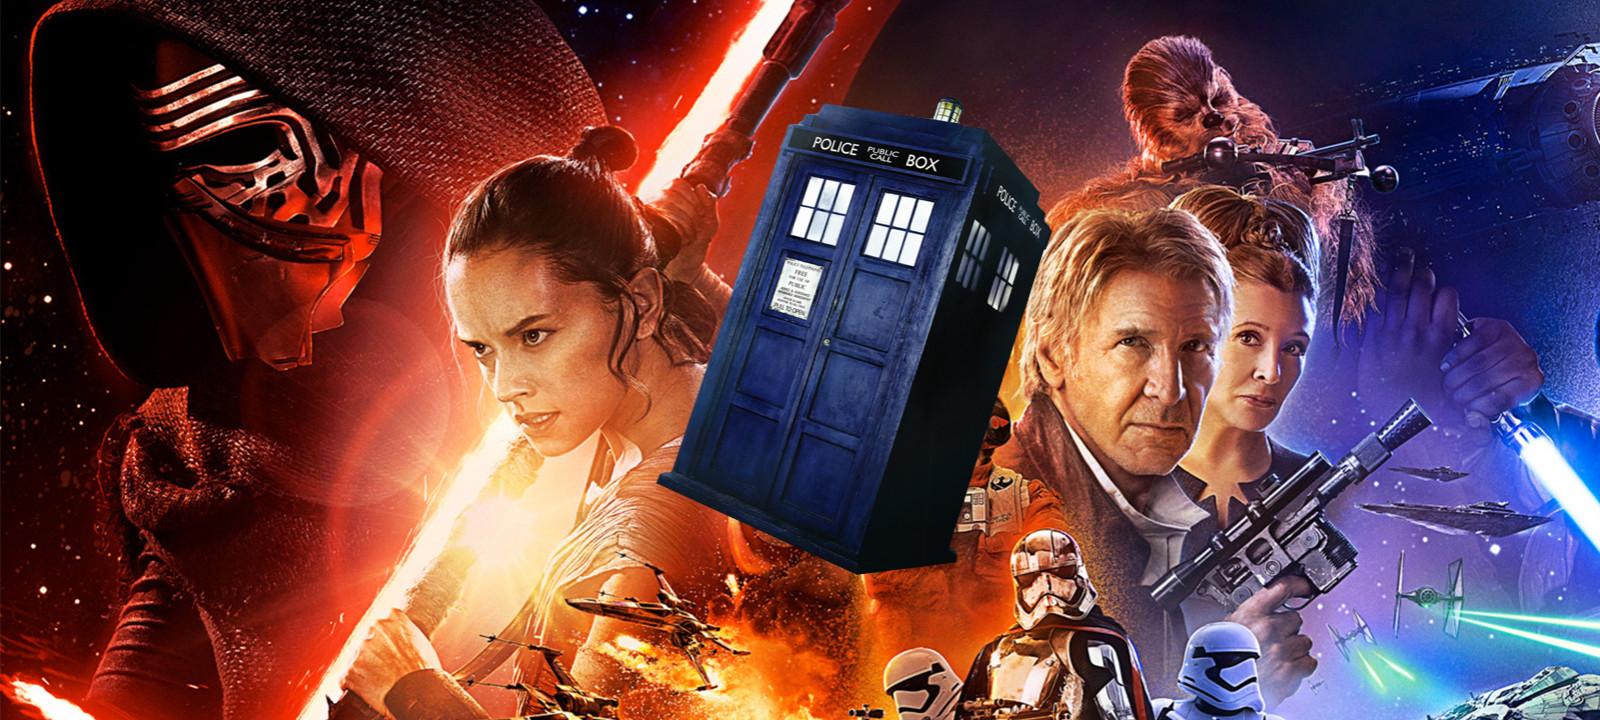 Star Who, anyone? (Photos: Lucasfilm/BBC)